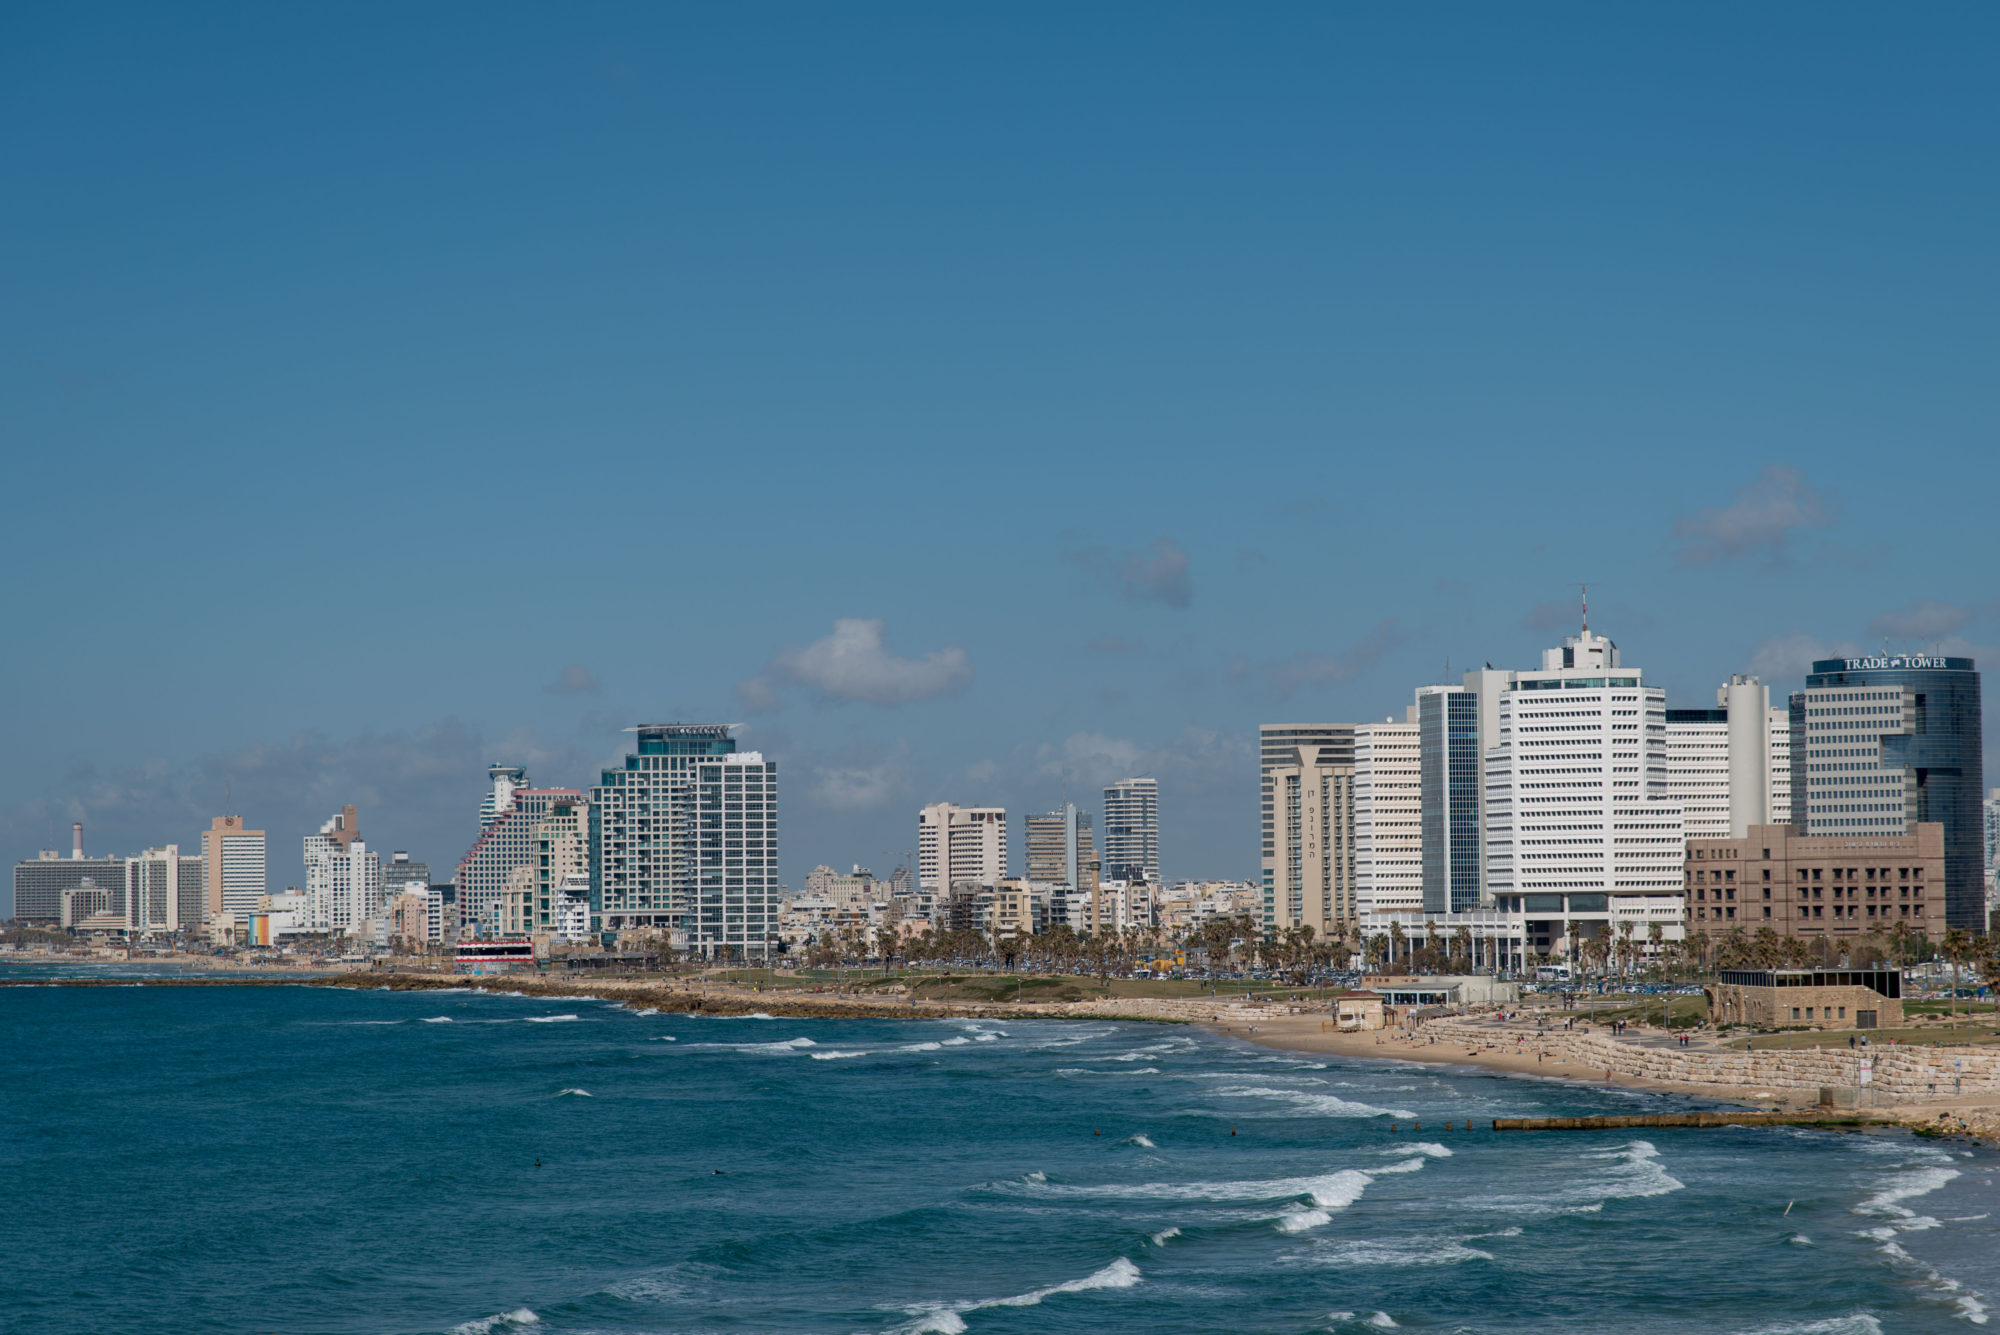 Tel Aviv Jaffa skyline - Anton Mislawsky photographer